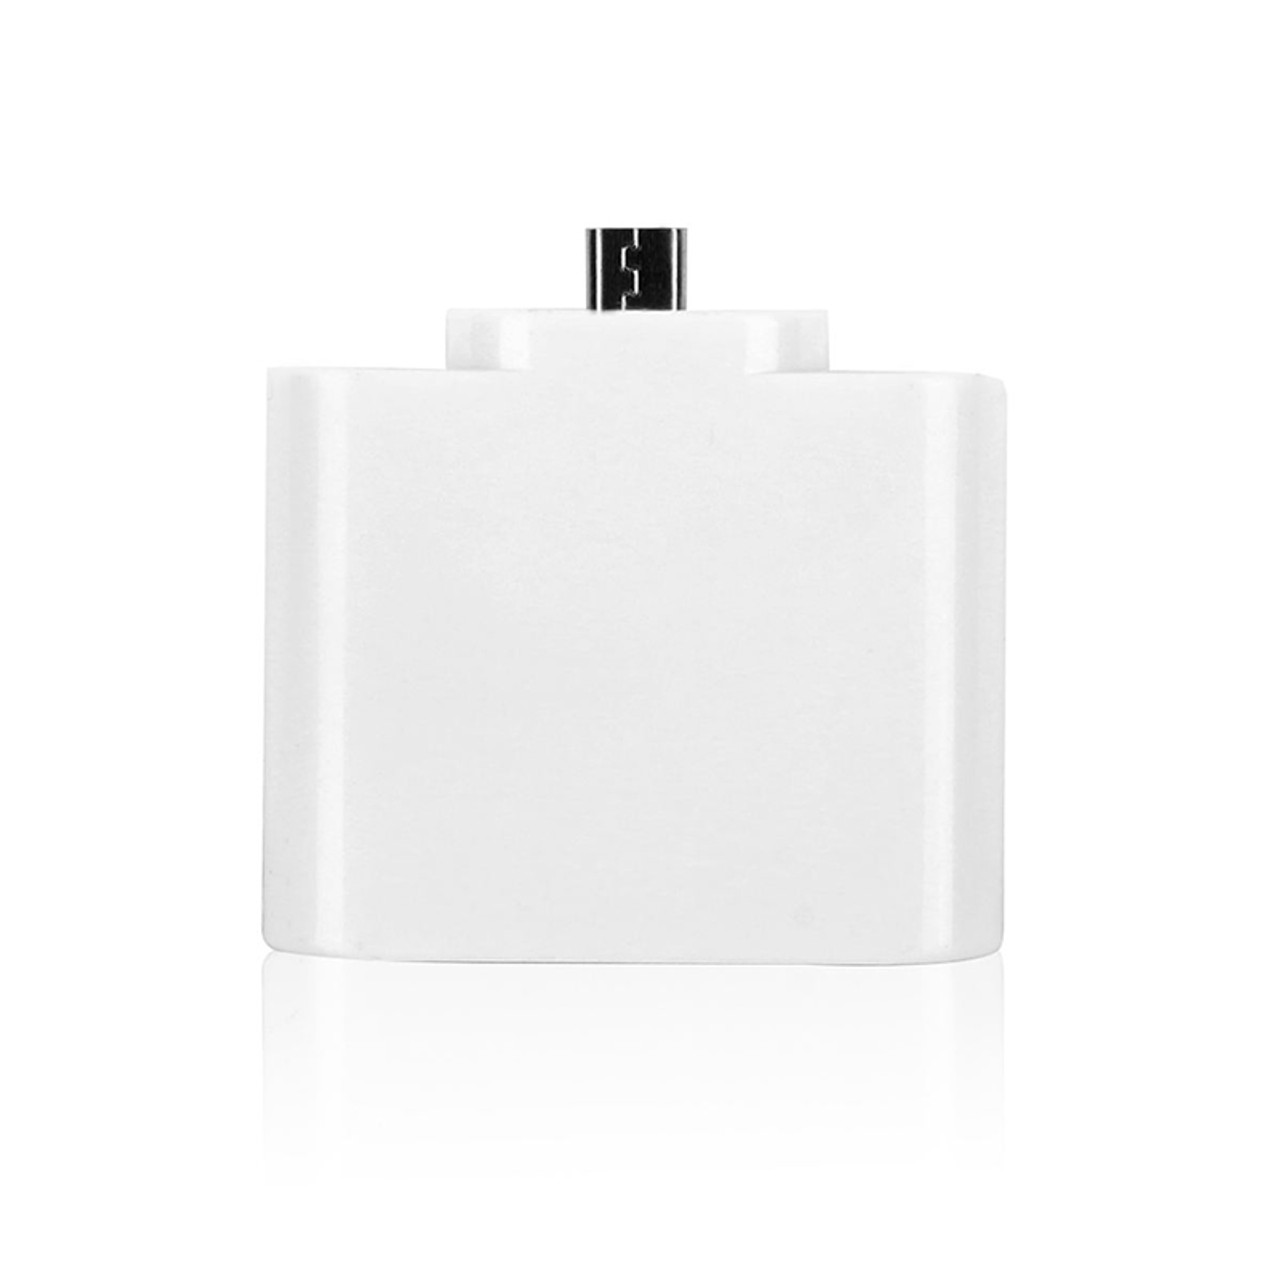 ER200L - NFC Card Reader Micro USB Interface